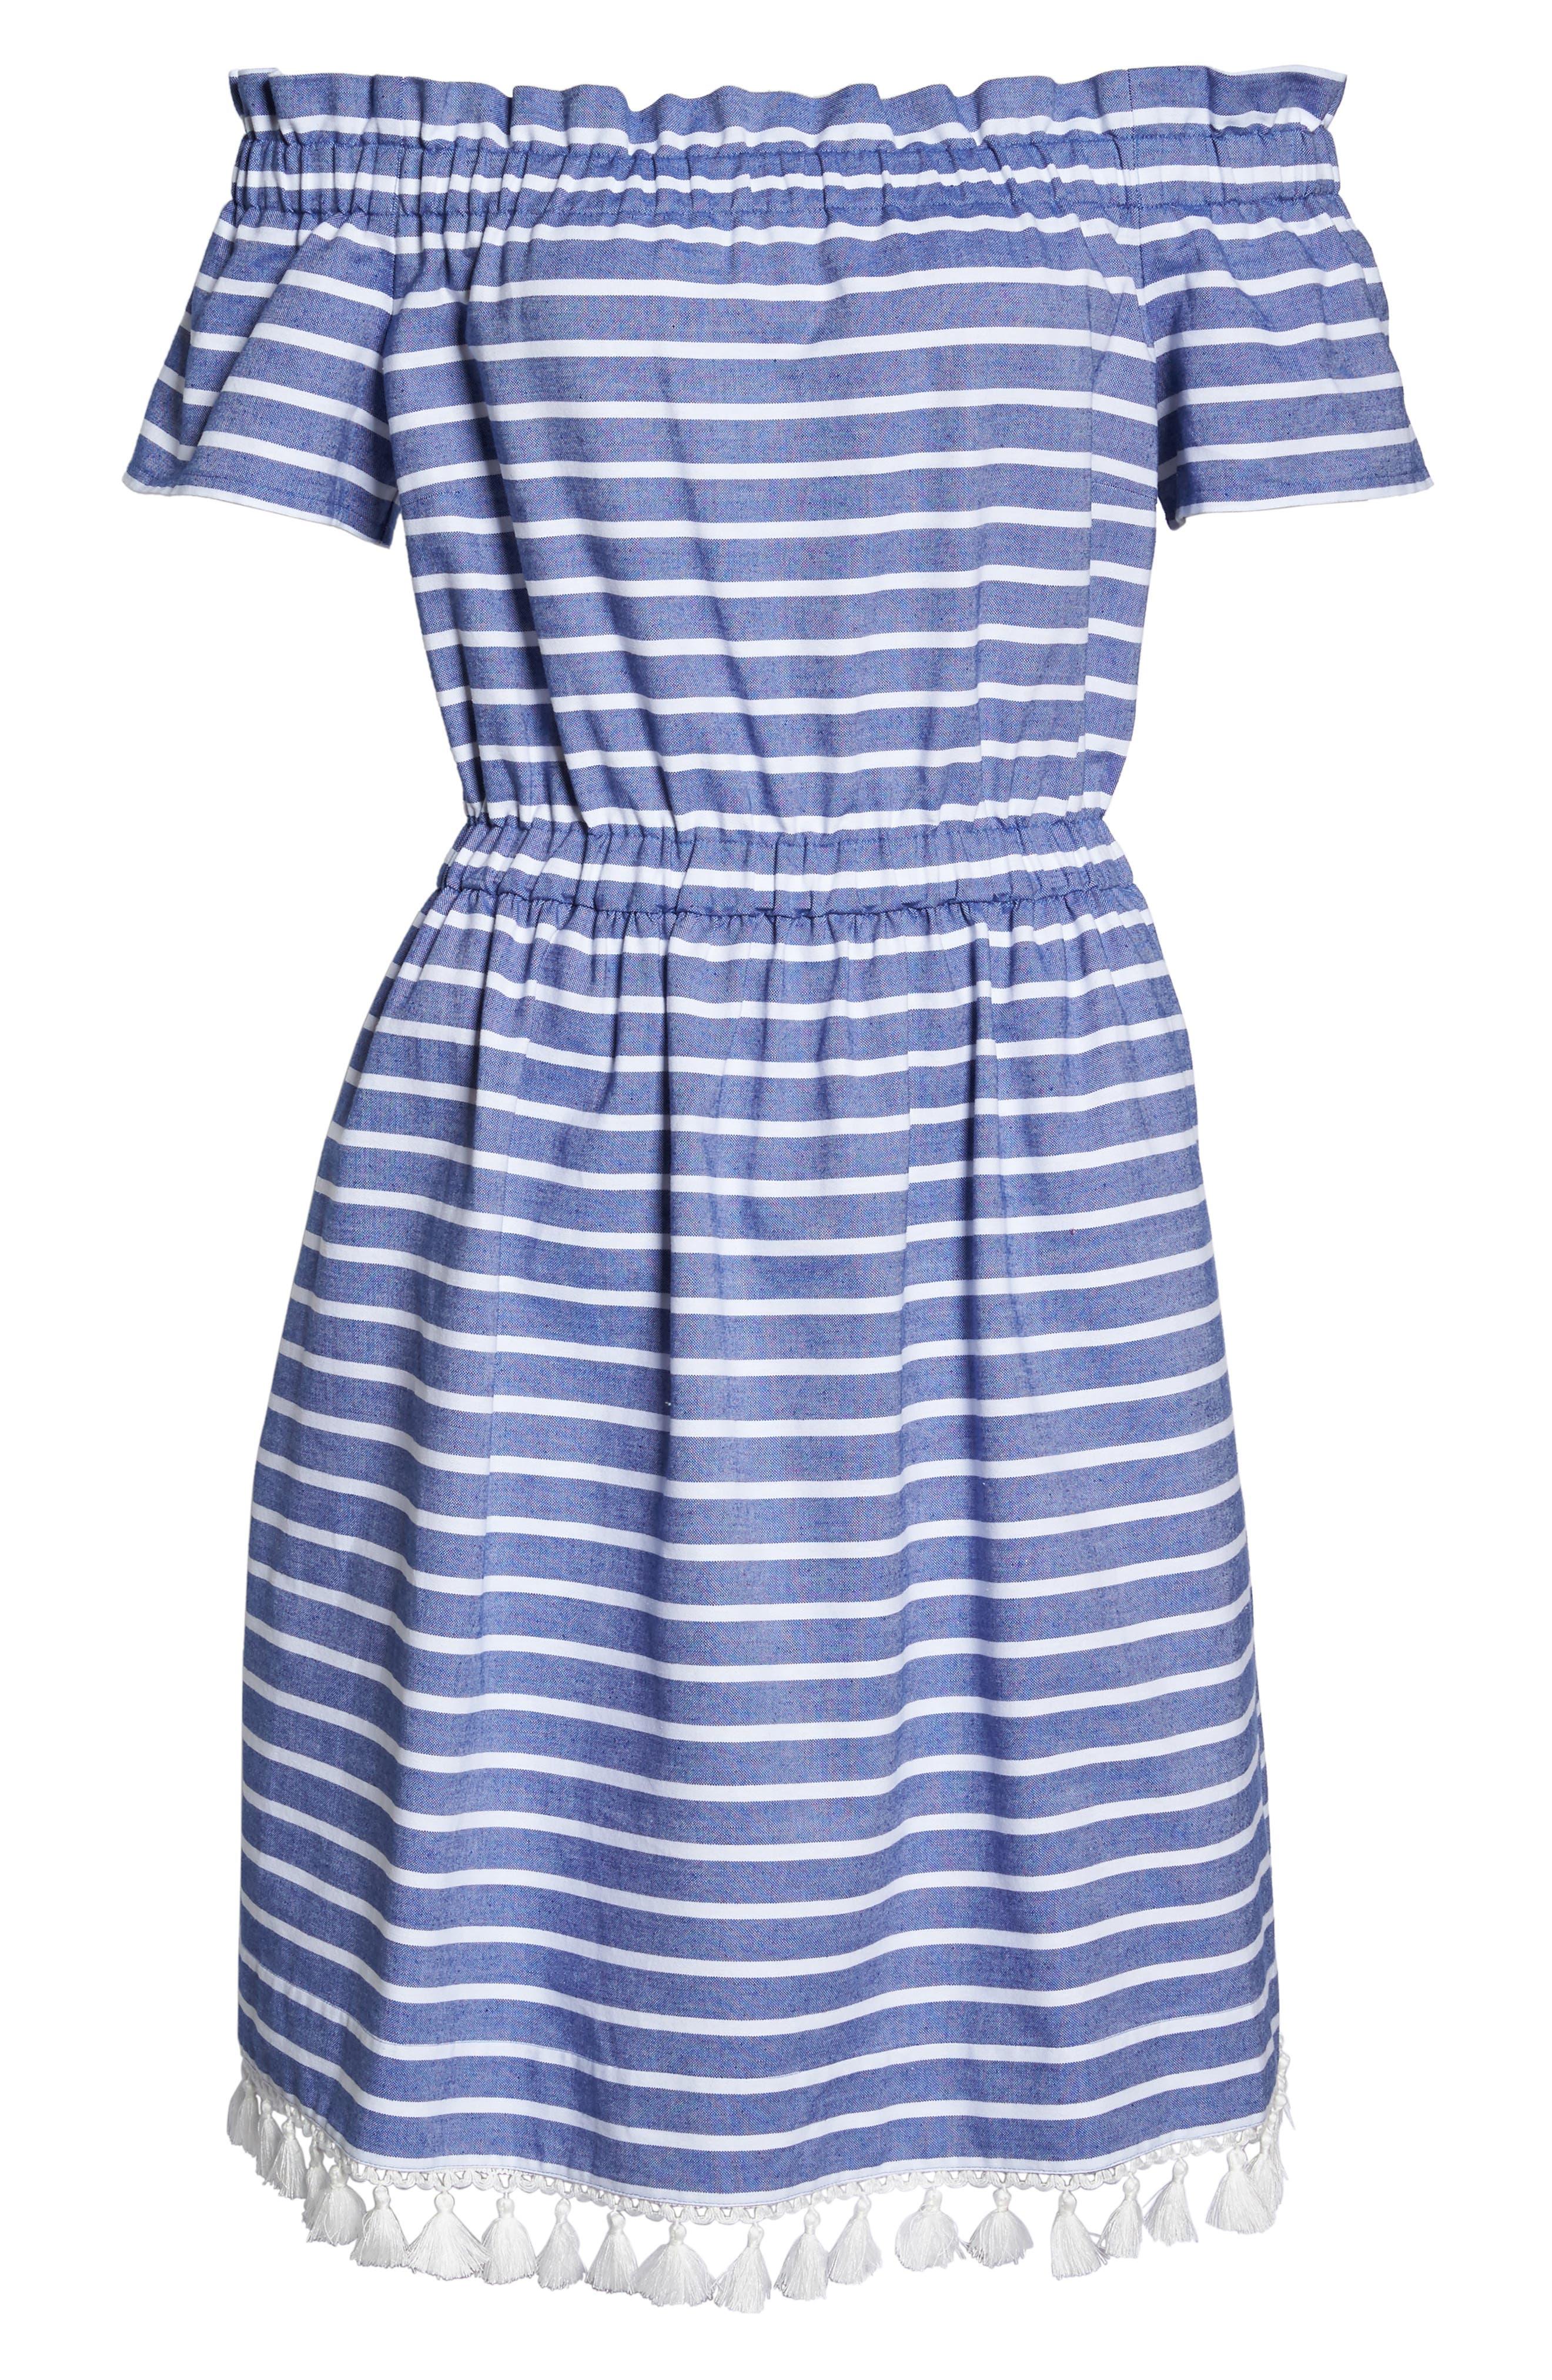 Stripe Off the Shoulder Dress,                             Alternate thumbnail 6, color,                             Navy/ Ivory